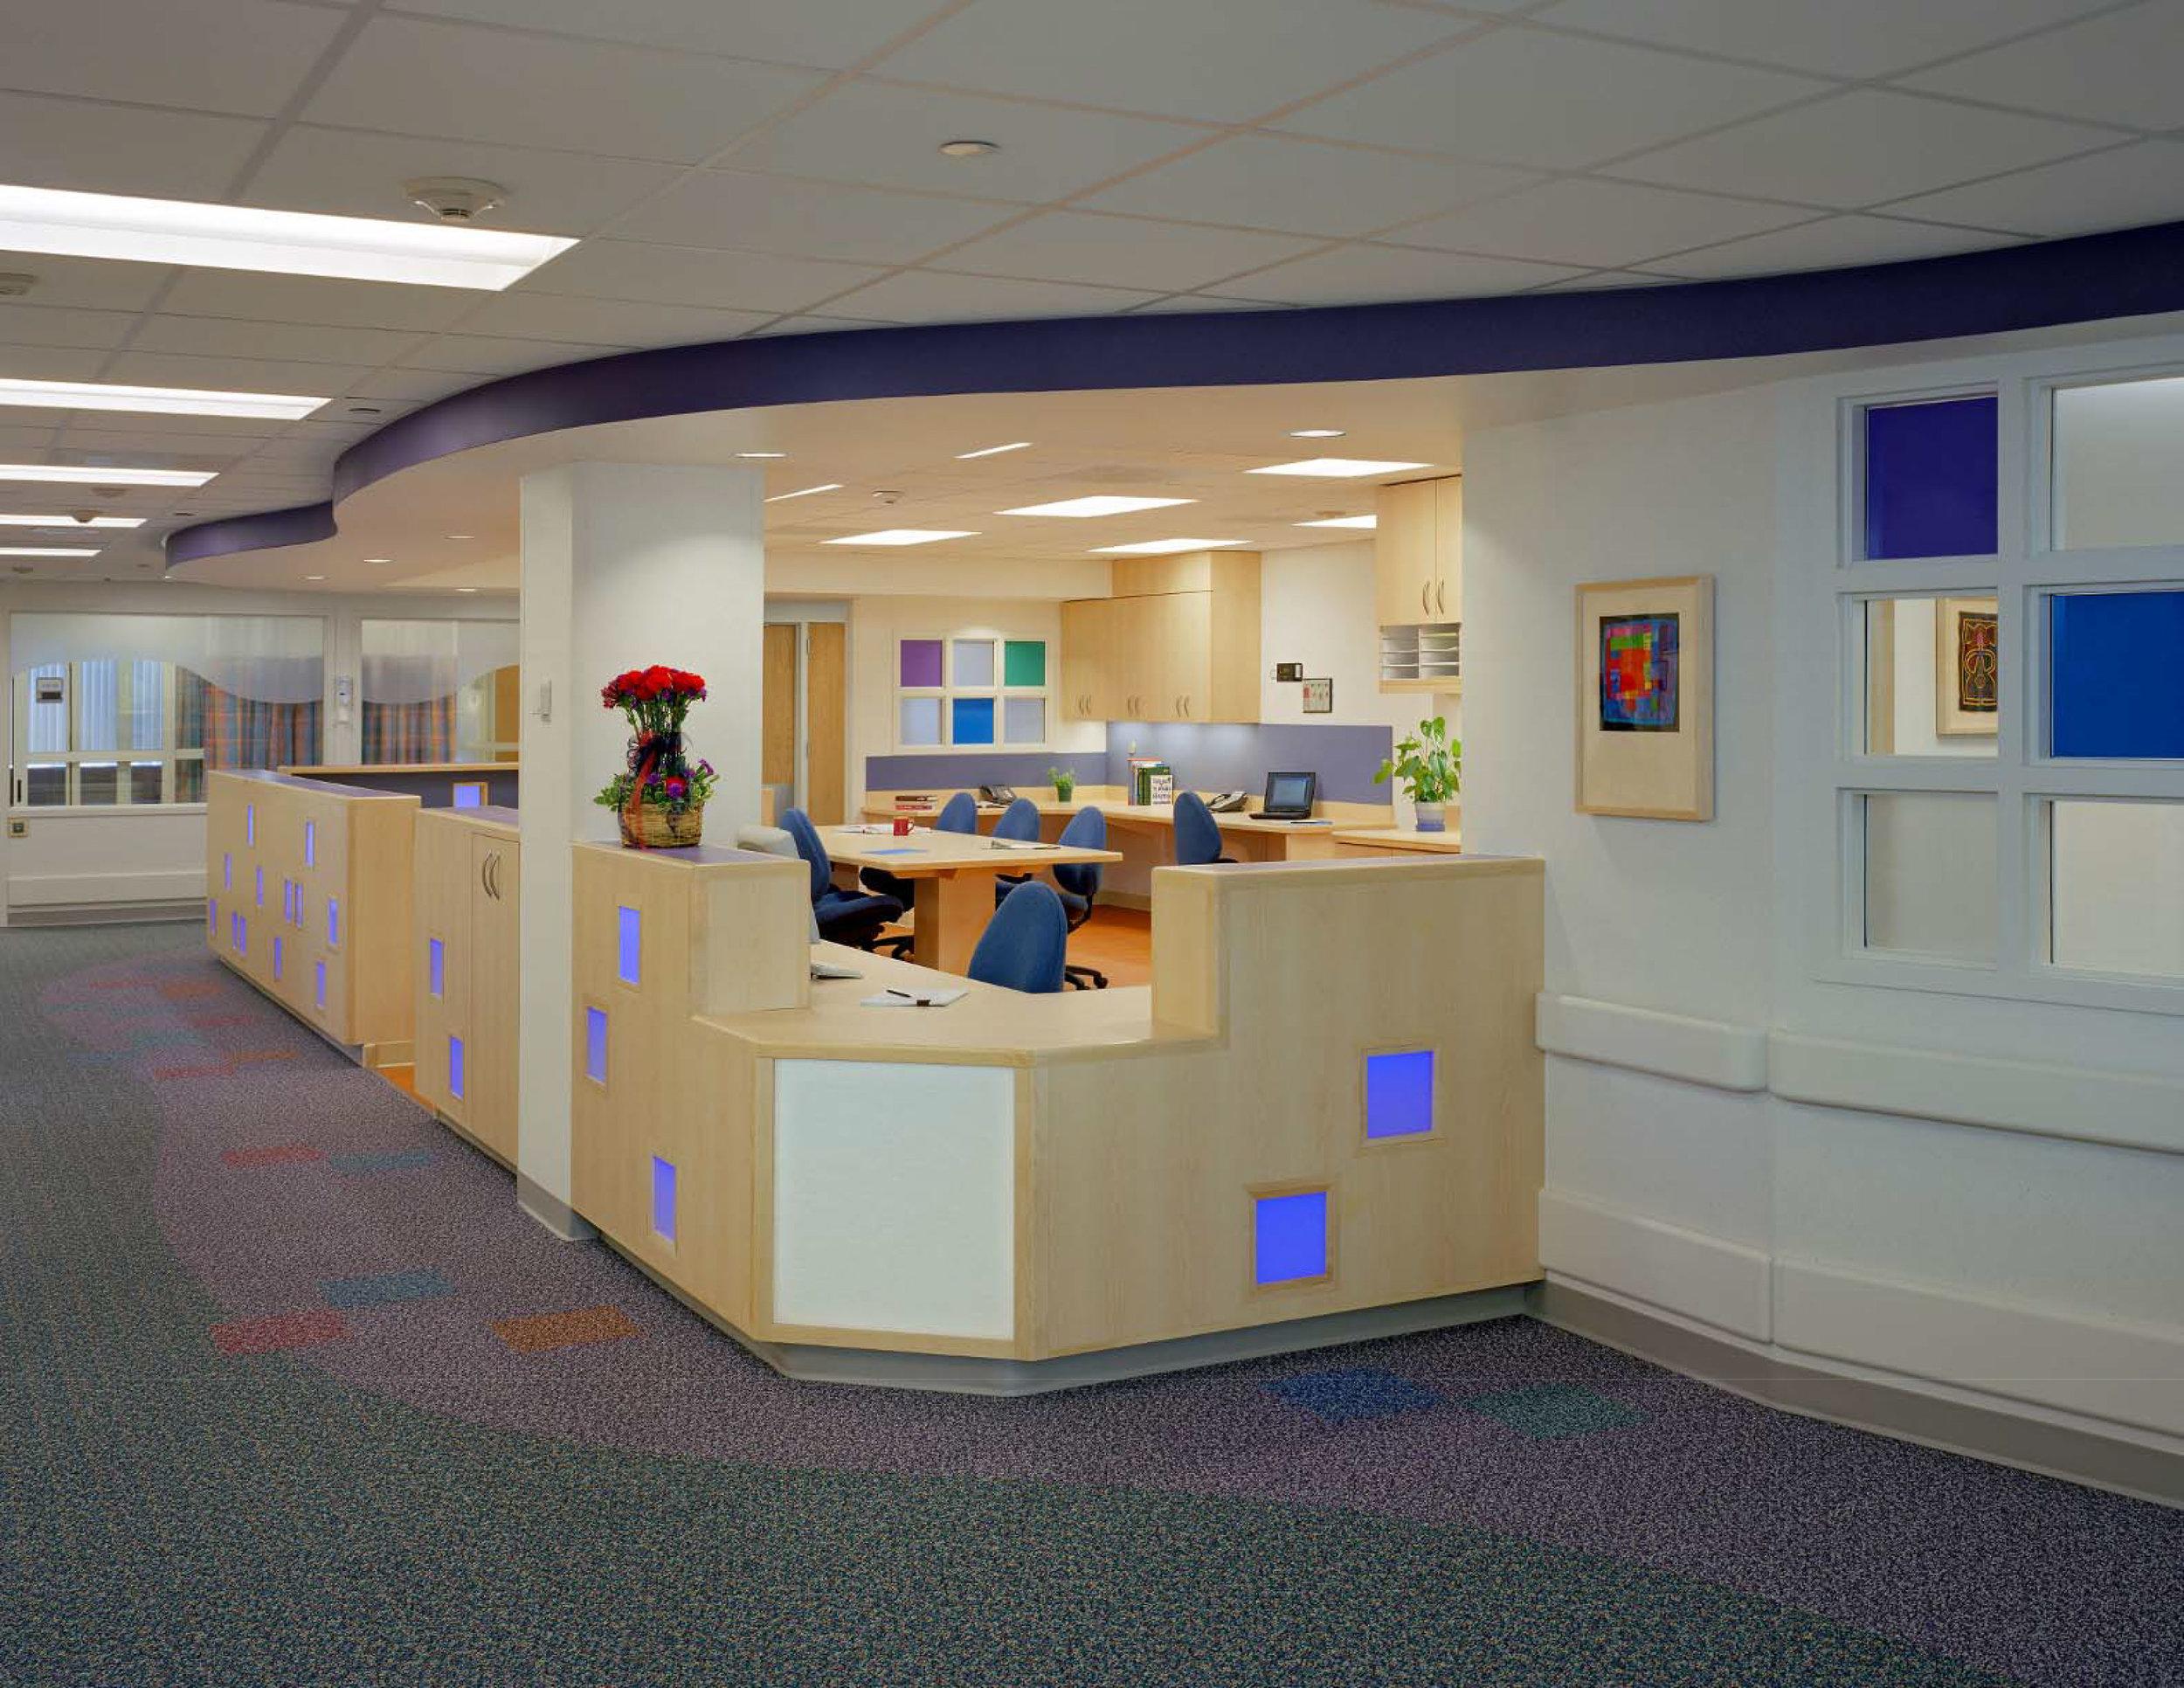 St.-Louis-Children's-Hospital-8th-floor-nurse-station.jpg